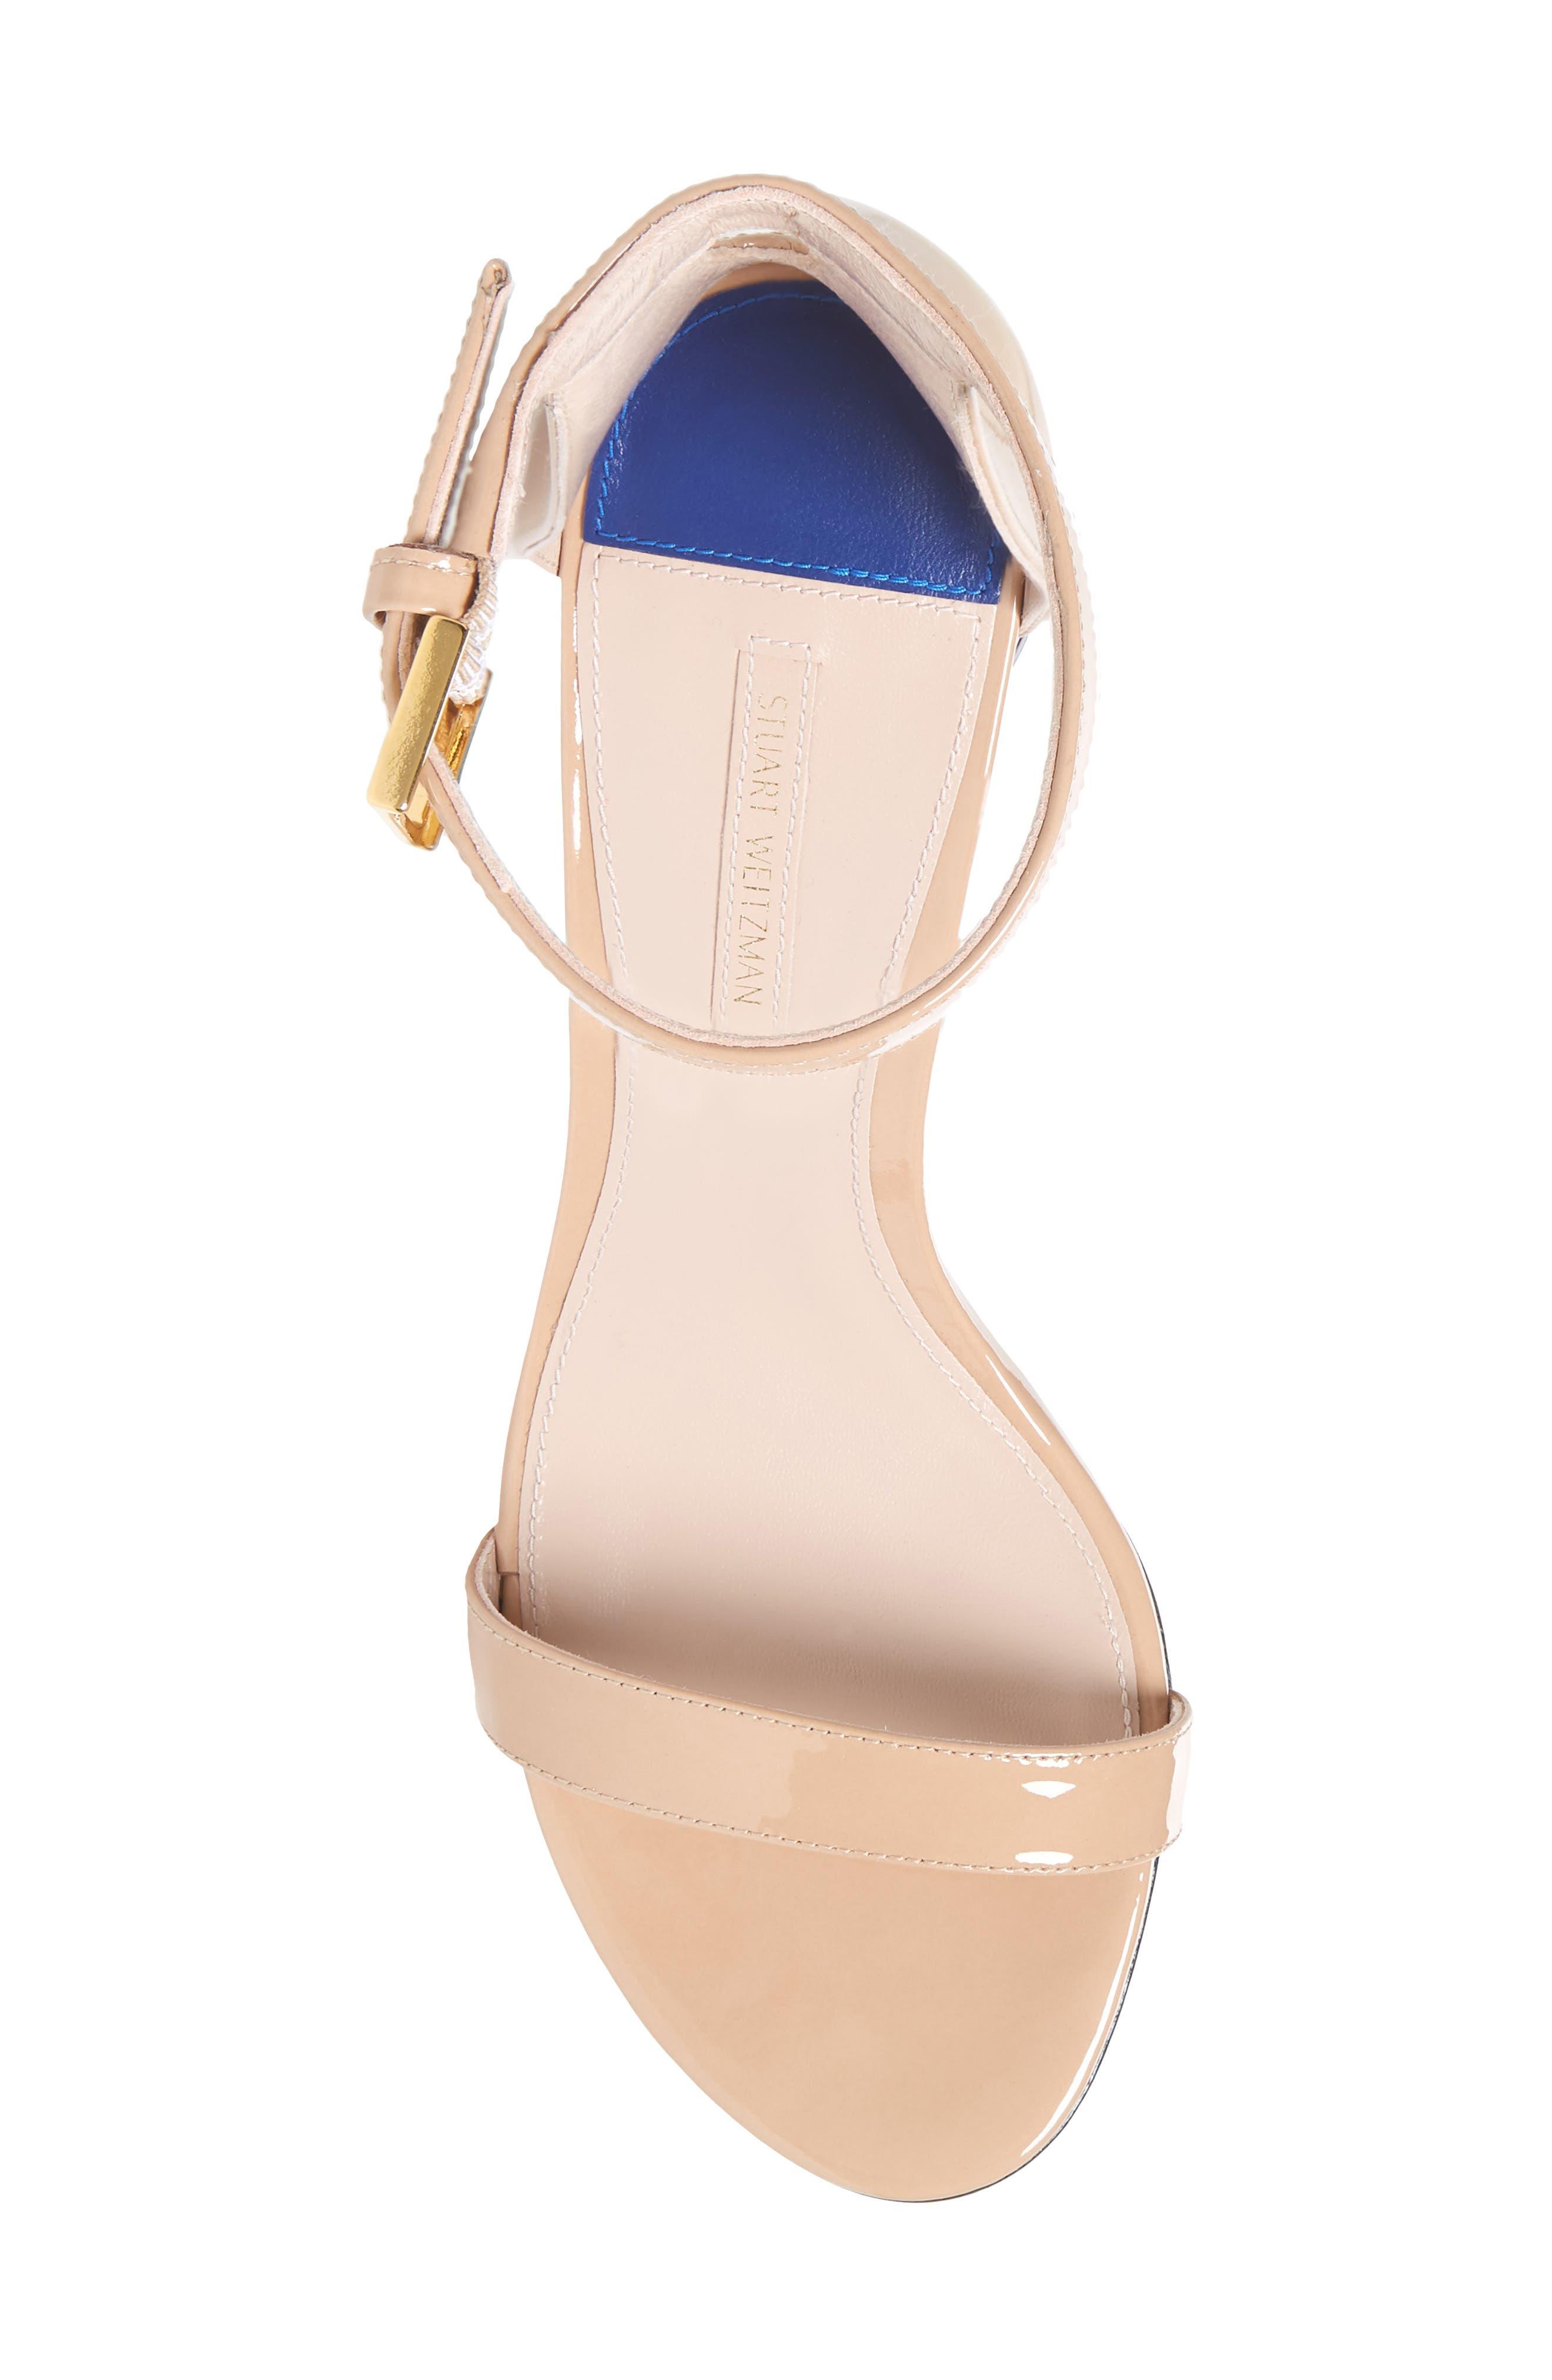 75LESSNUDIST Ankle Strap Sandal,                             Alternate thumbnail 5, color,                             ADOBE CRISTAL